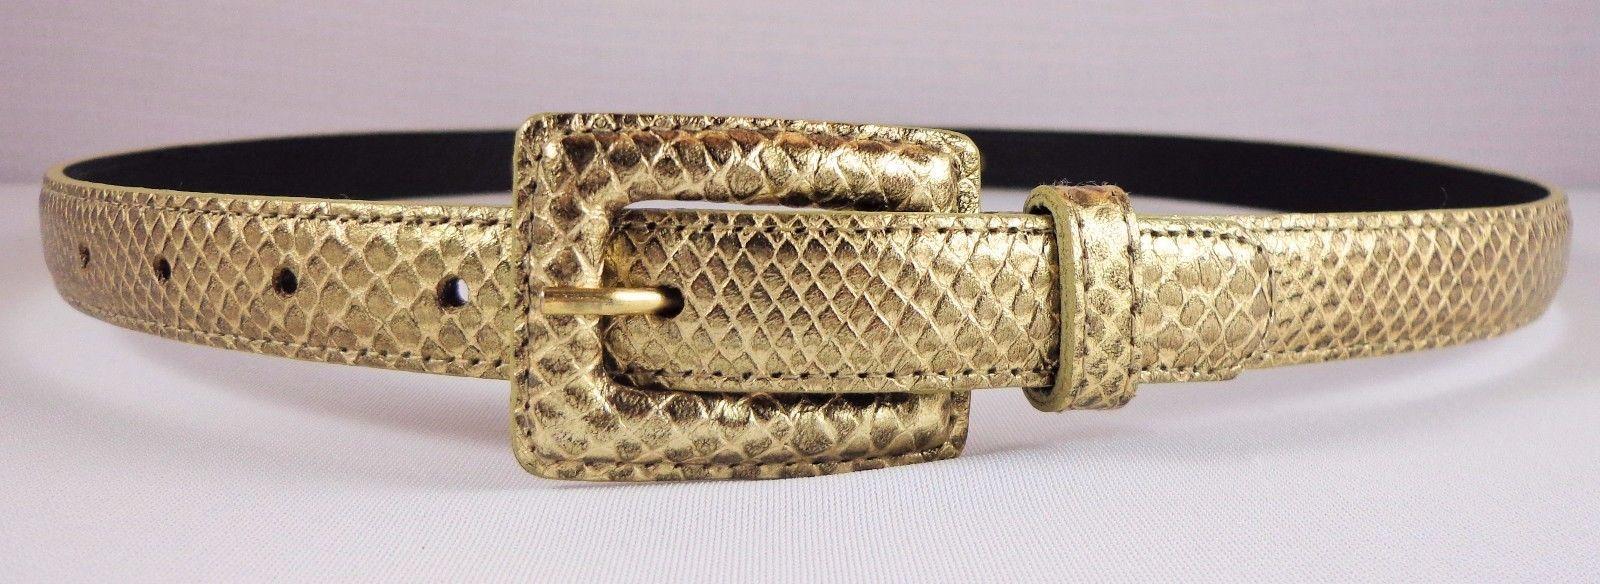 Ellen Tracy Linda Allard Genuine Leather Gold Animal Print Belt Womens Size 10